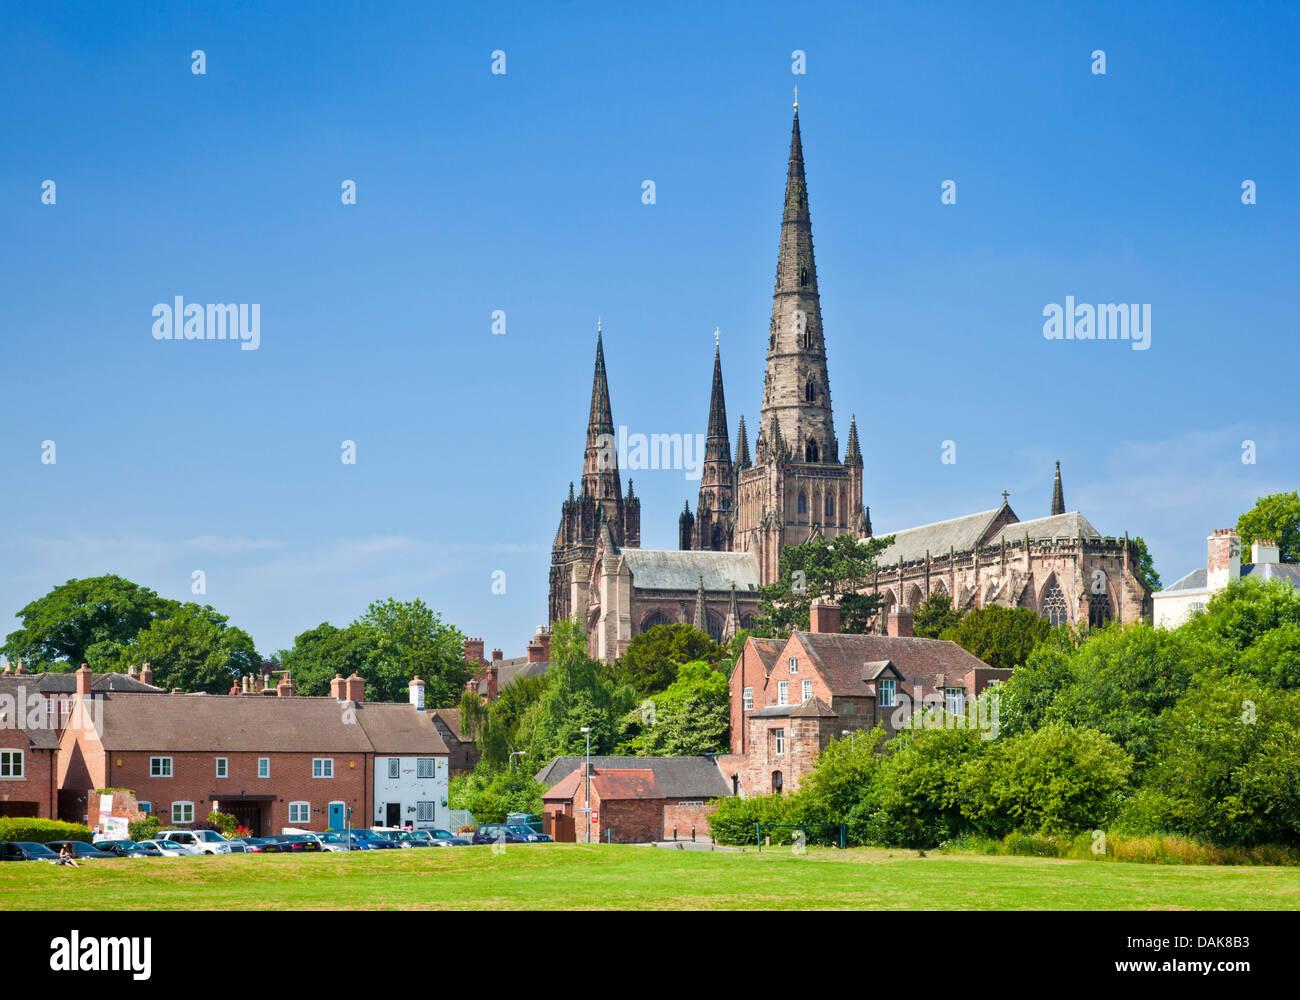 Lichfield cathedral from Stowe Field Lichfield Staffordshire England UK GB EU Europe - Stock Image